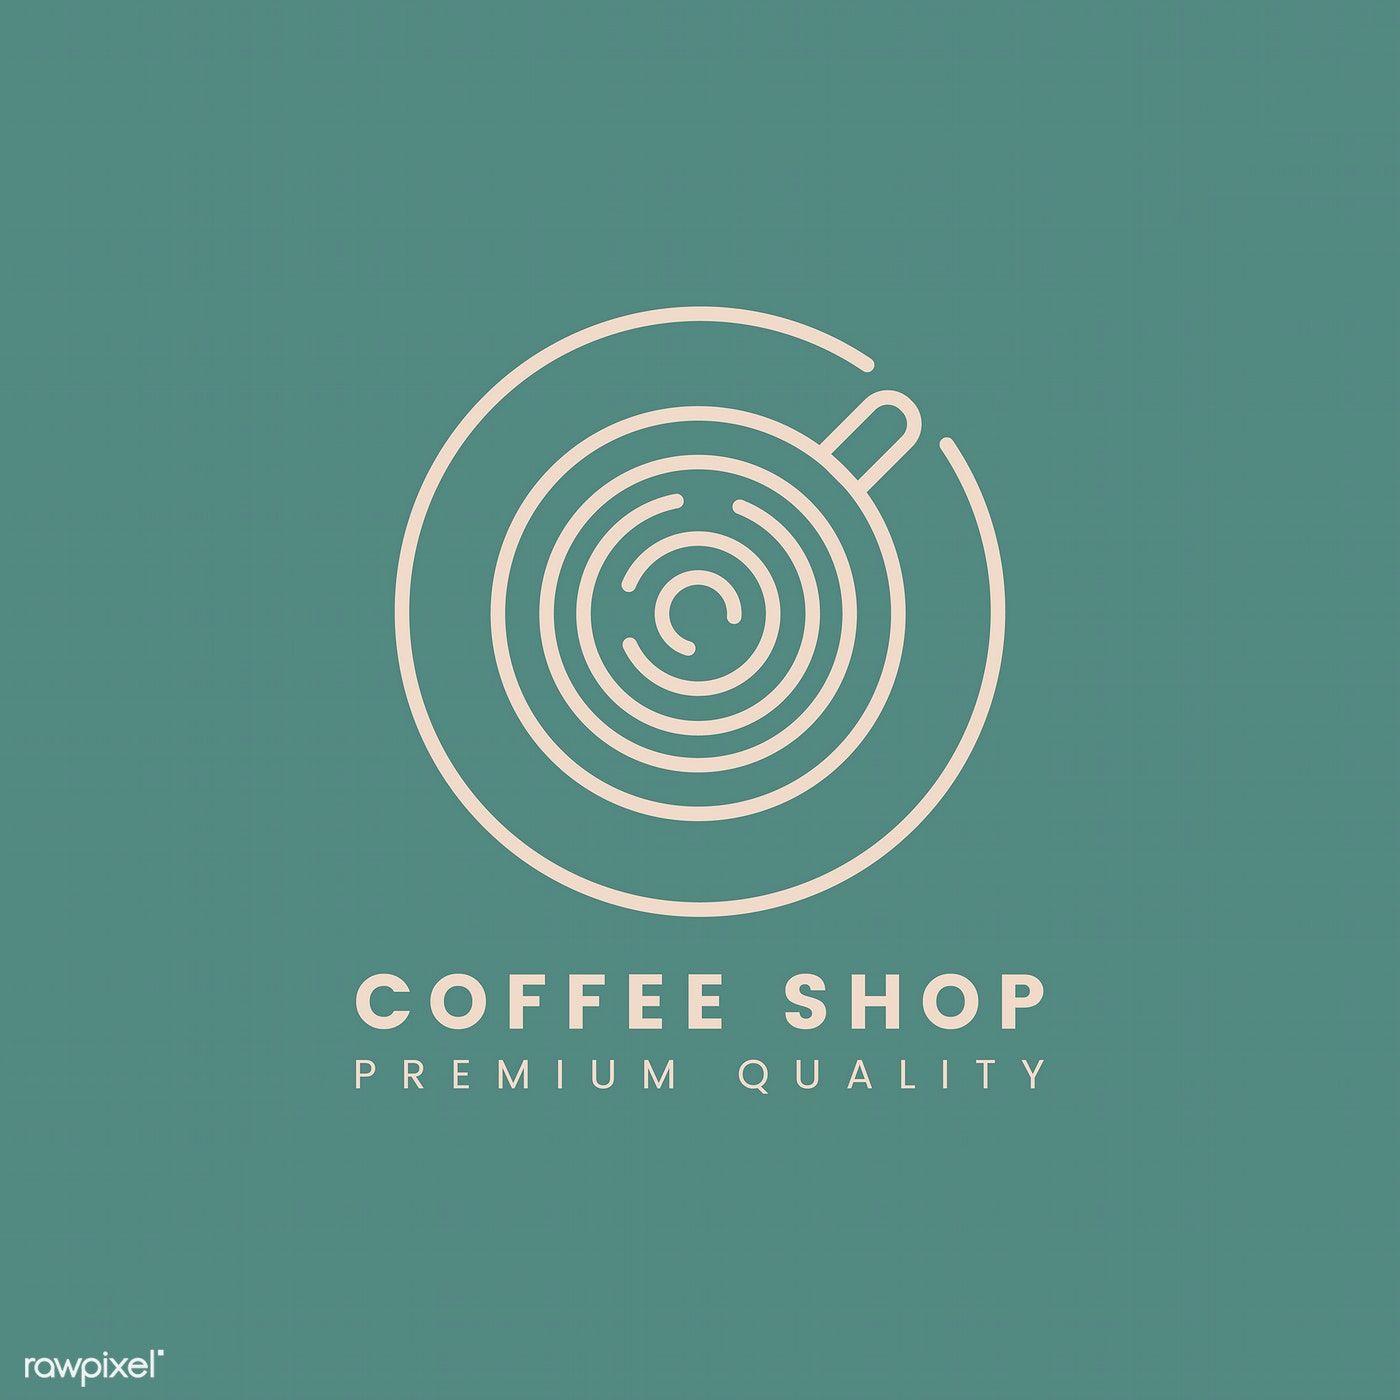 Premium Quality Coffee Shop Logo Vector Free Image By Rawpixel Com Aew Coffee Shop Logo Cafe Logo Design Coffee Shop Logo Design